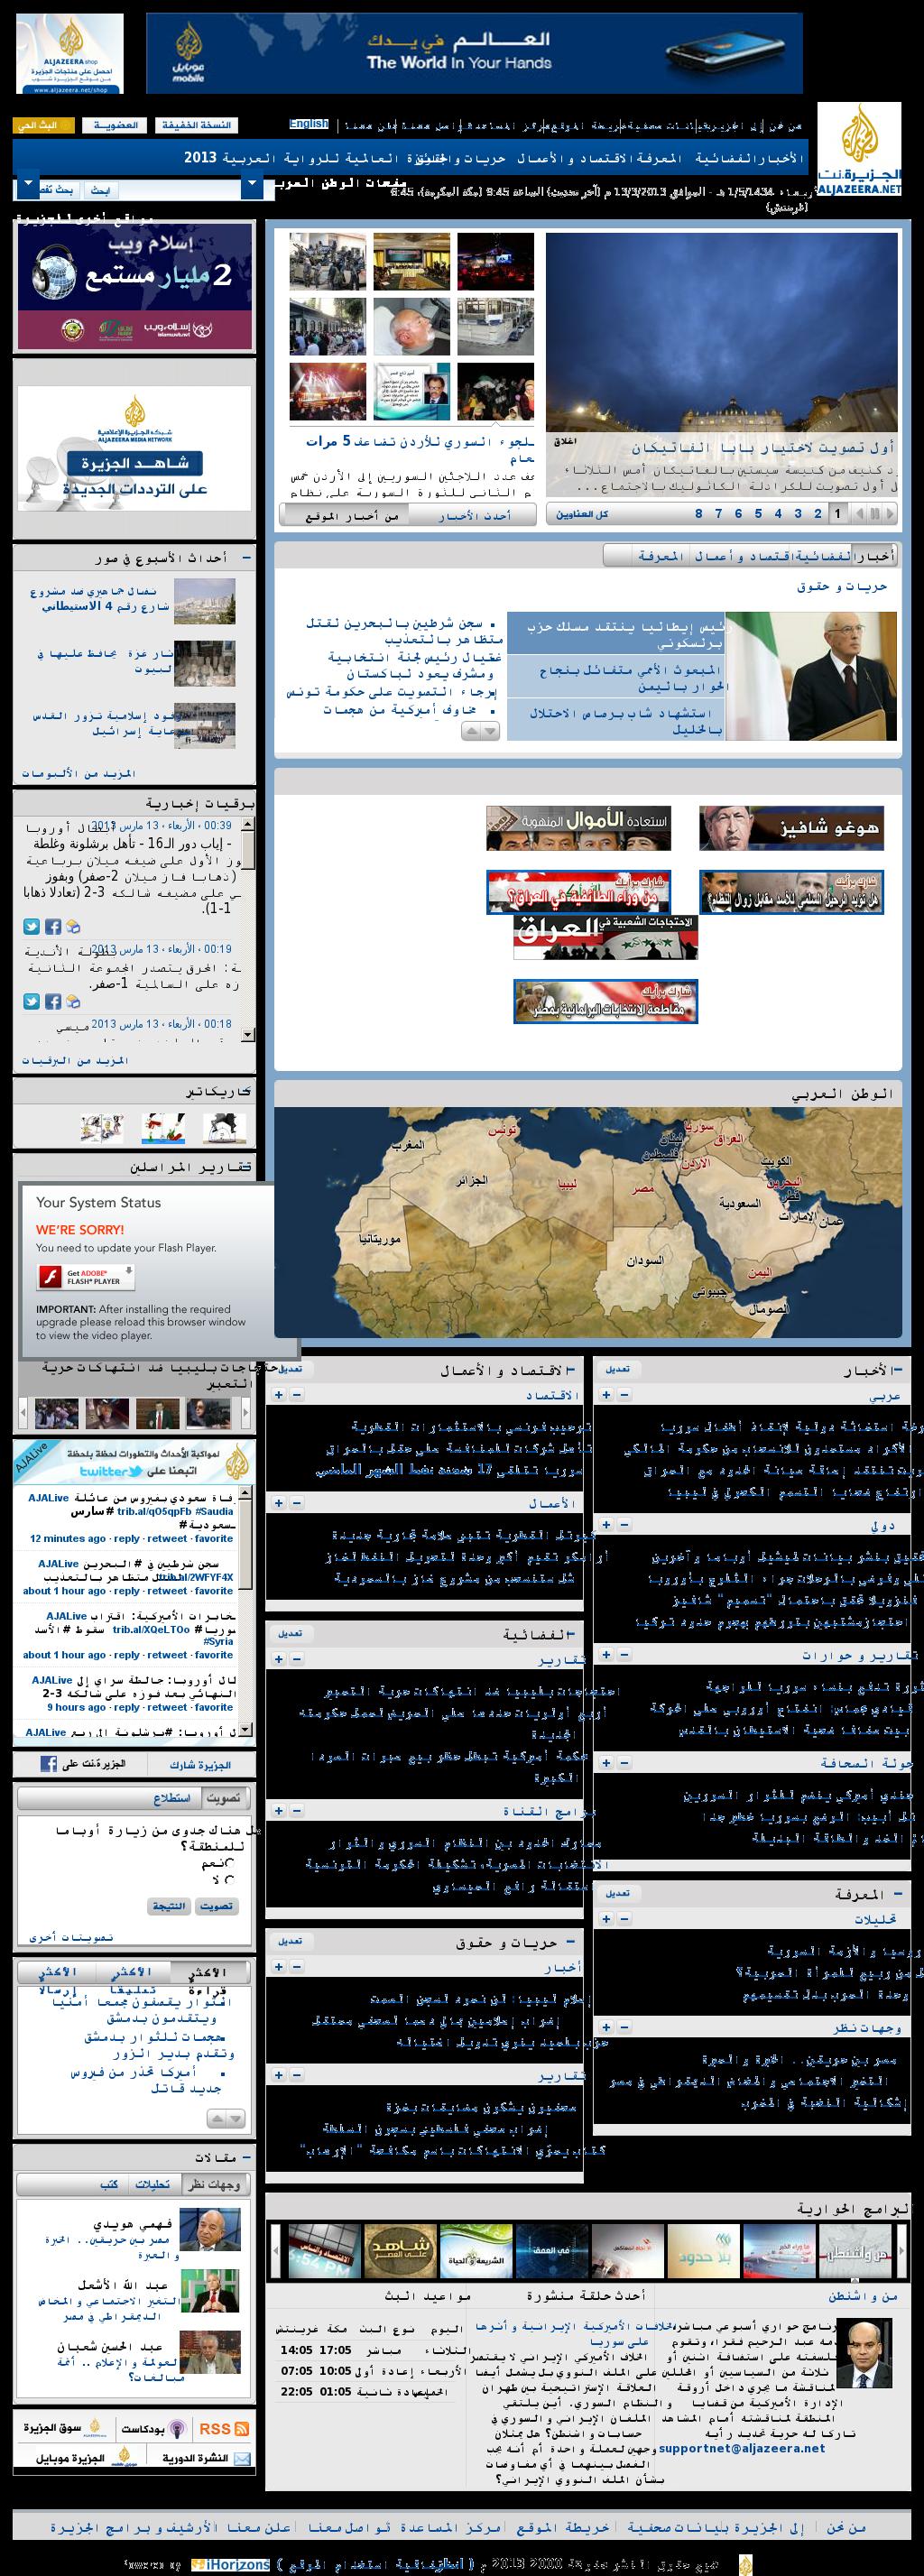 Al Jazeera at Wednesday March 13, 2013, 7:10 a.m. UTC